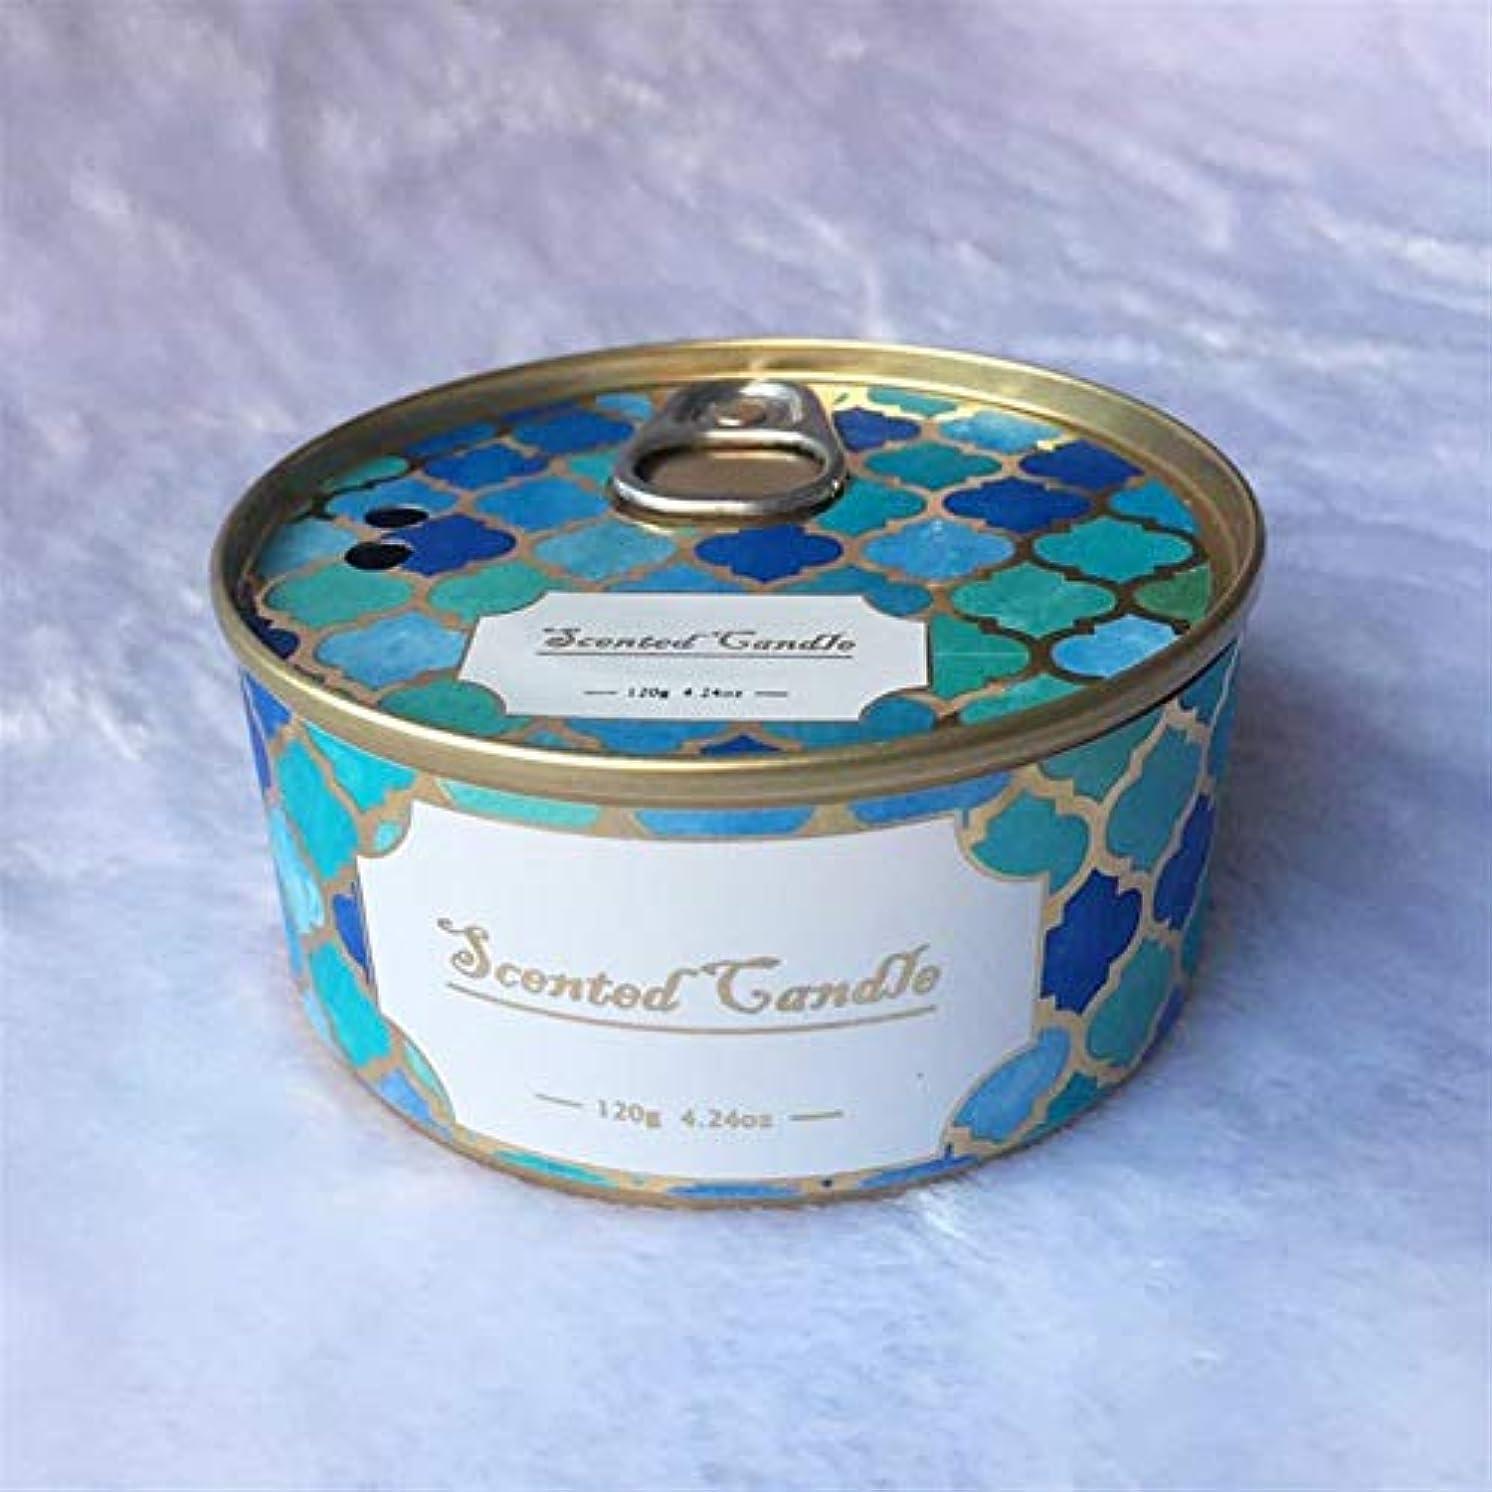 Guomao ブリキ缶植物エッセンシャルオイルハイエンドギフト大豆ワックスモスオーキッド香りのキャンドル (色 : Moss)